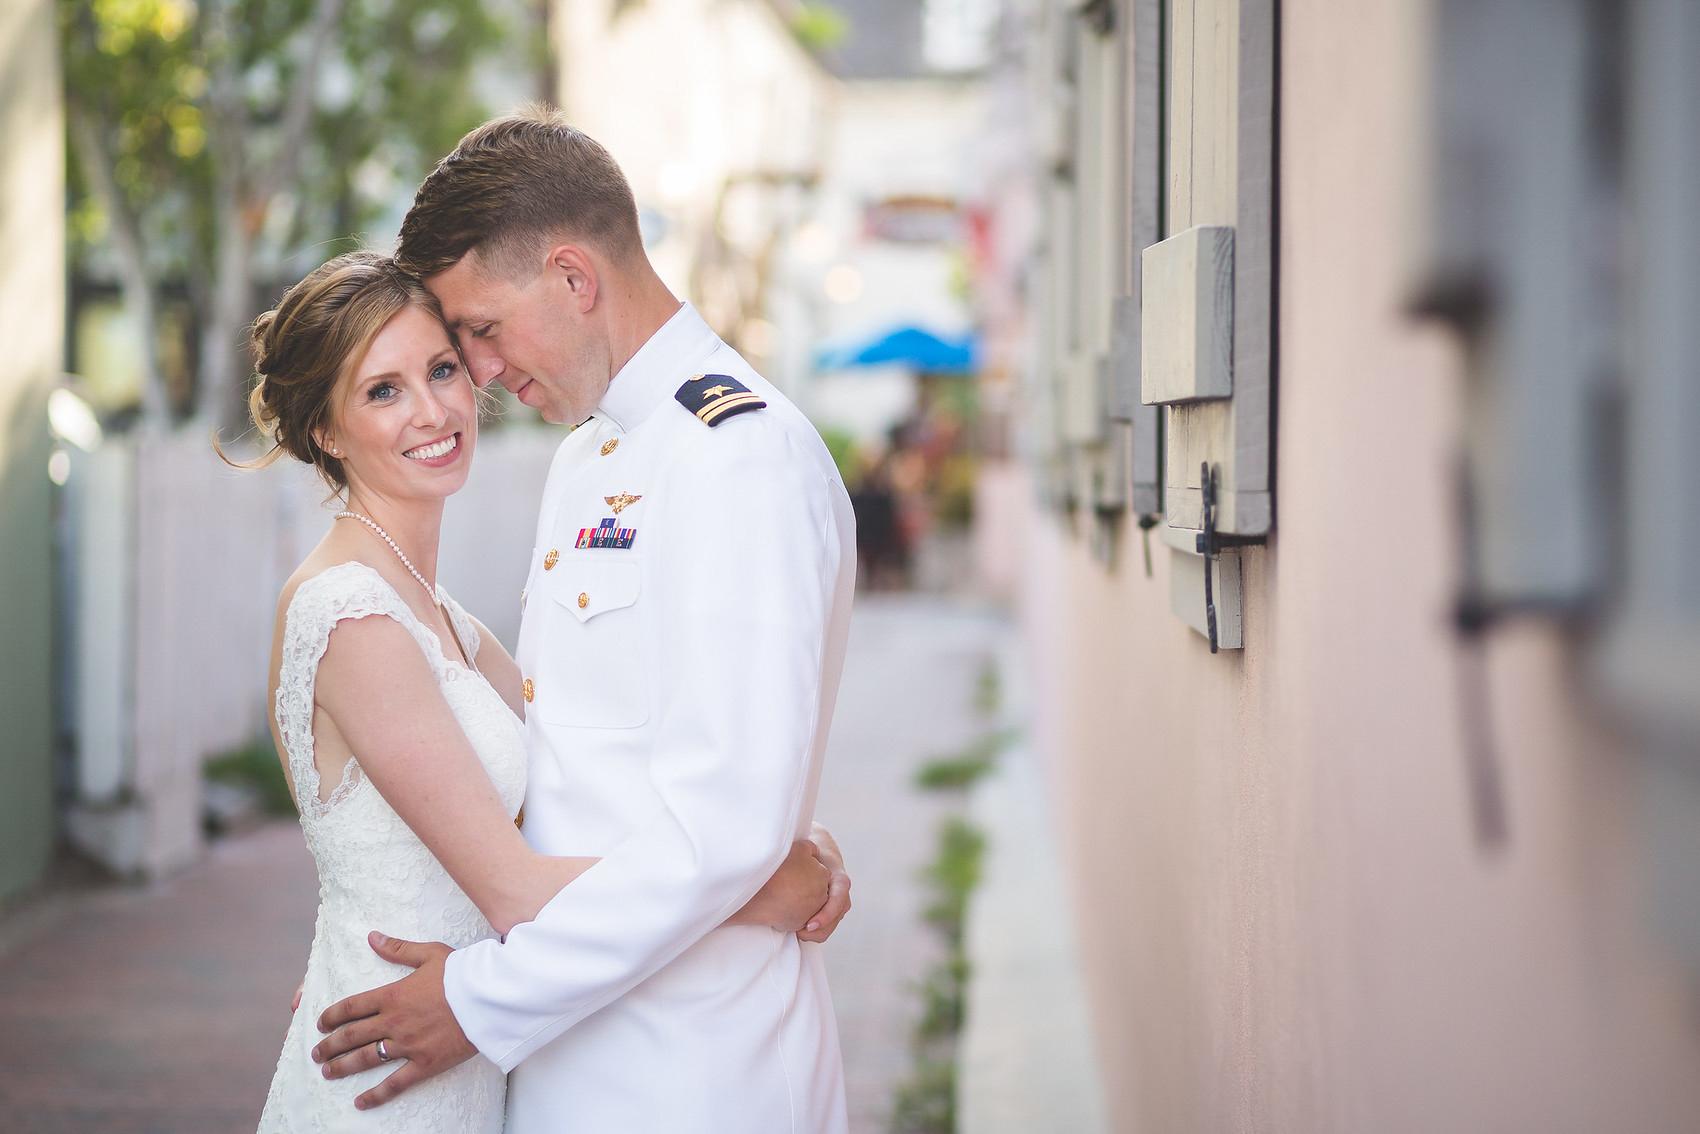 Adam-Szrmack-Bowing-the-white-room-st-augustine-wedding-photographer-80.jpg